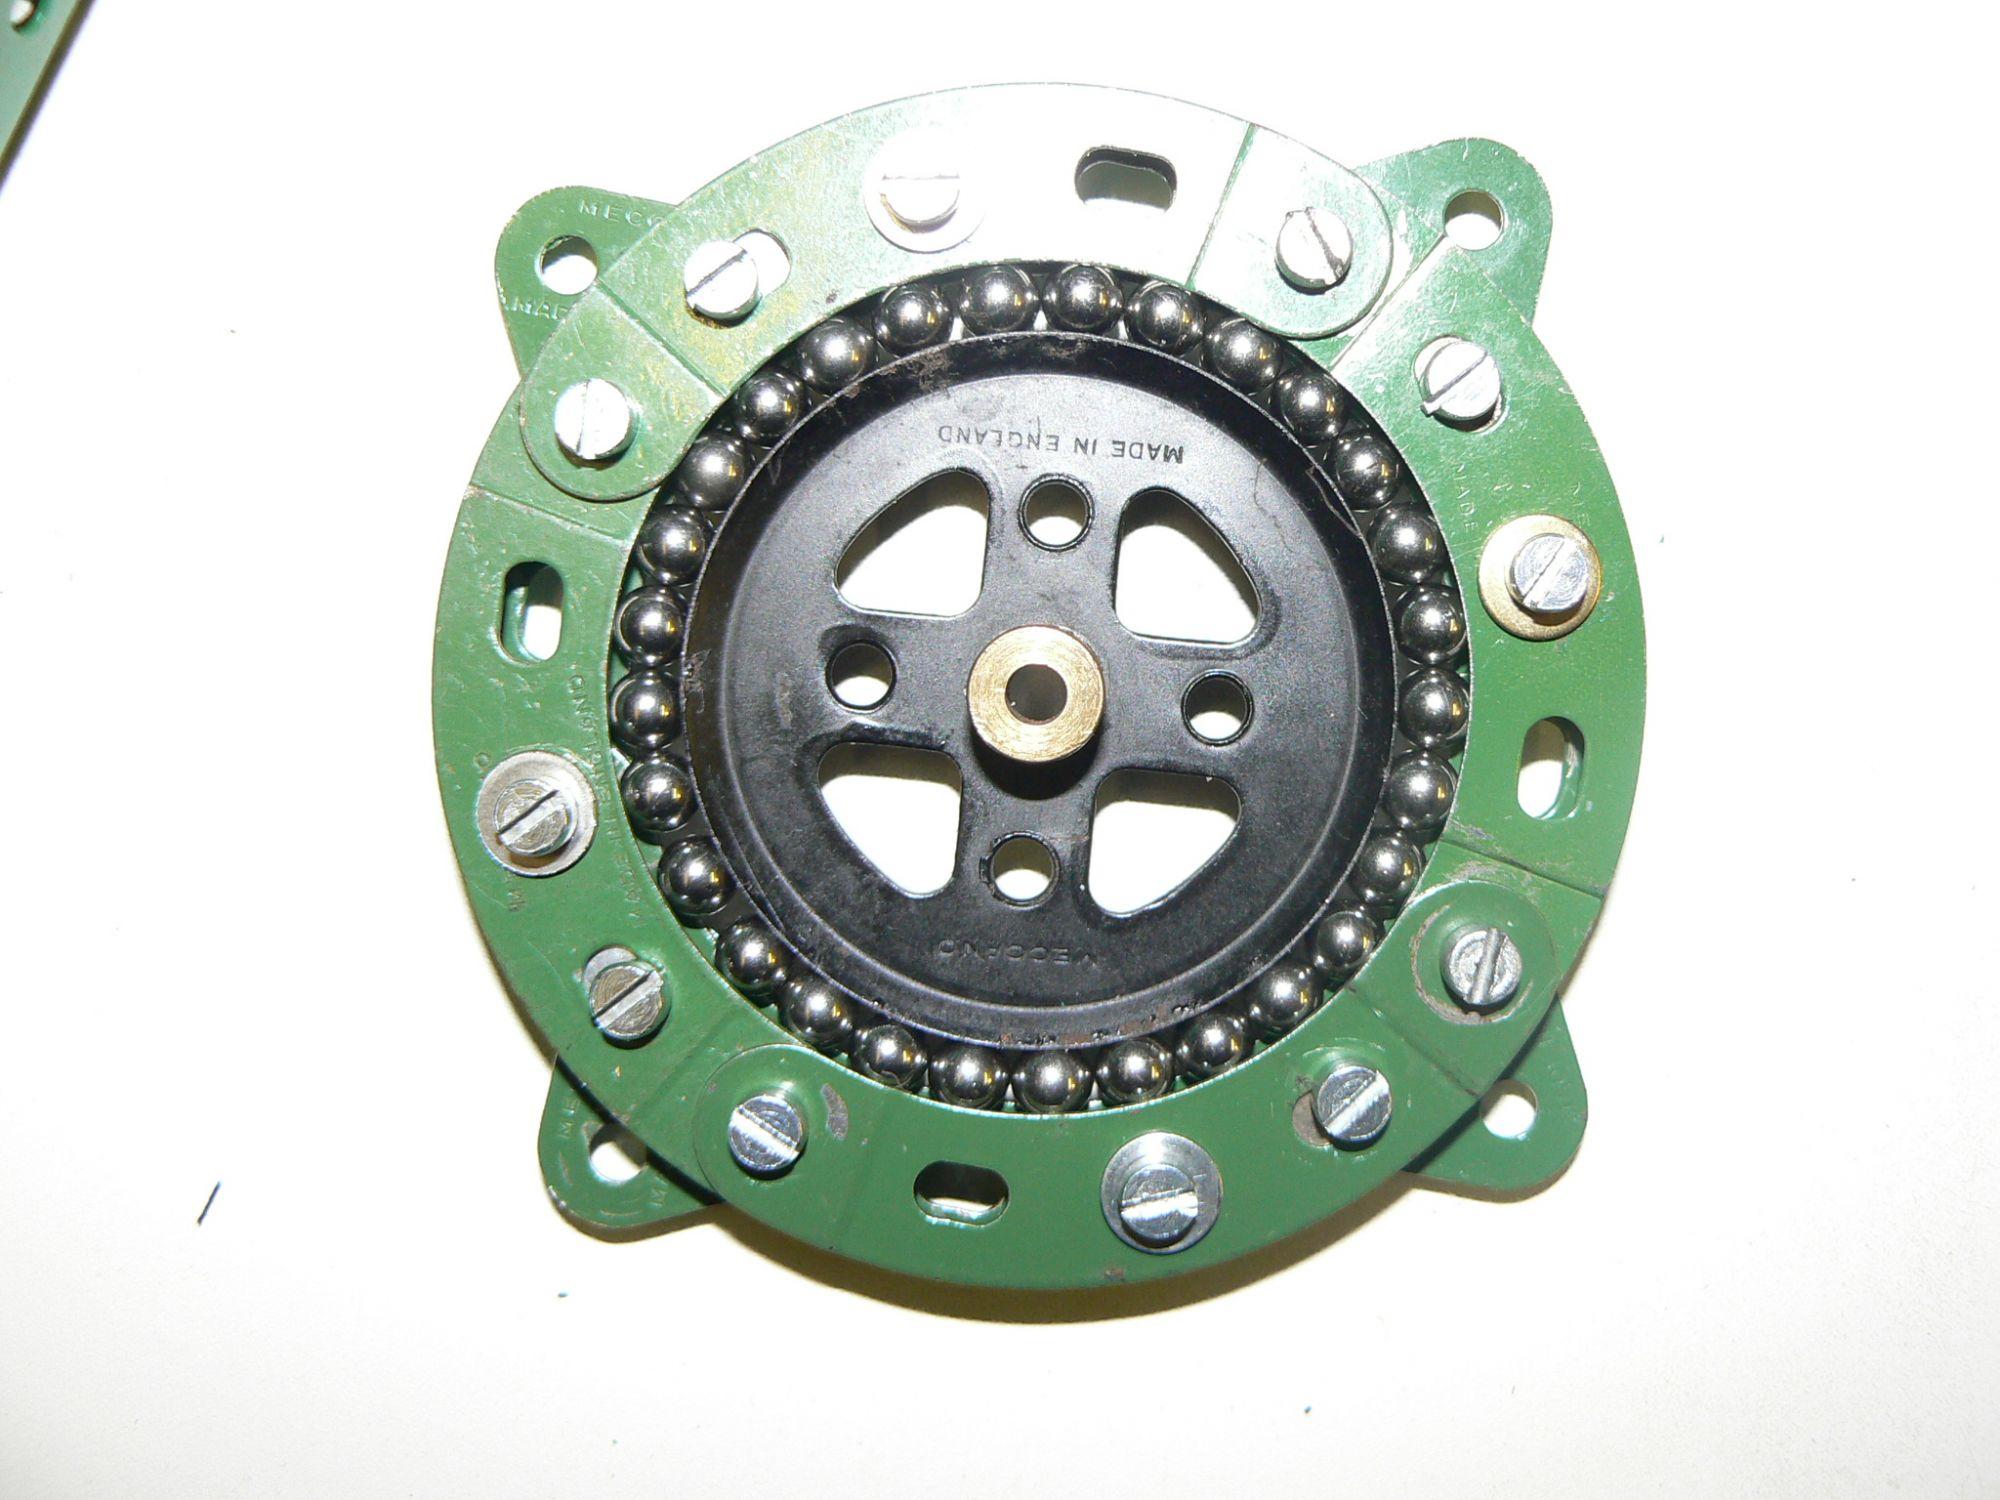 'Bottom bracket' bearing